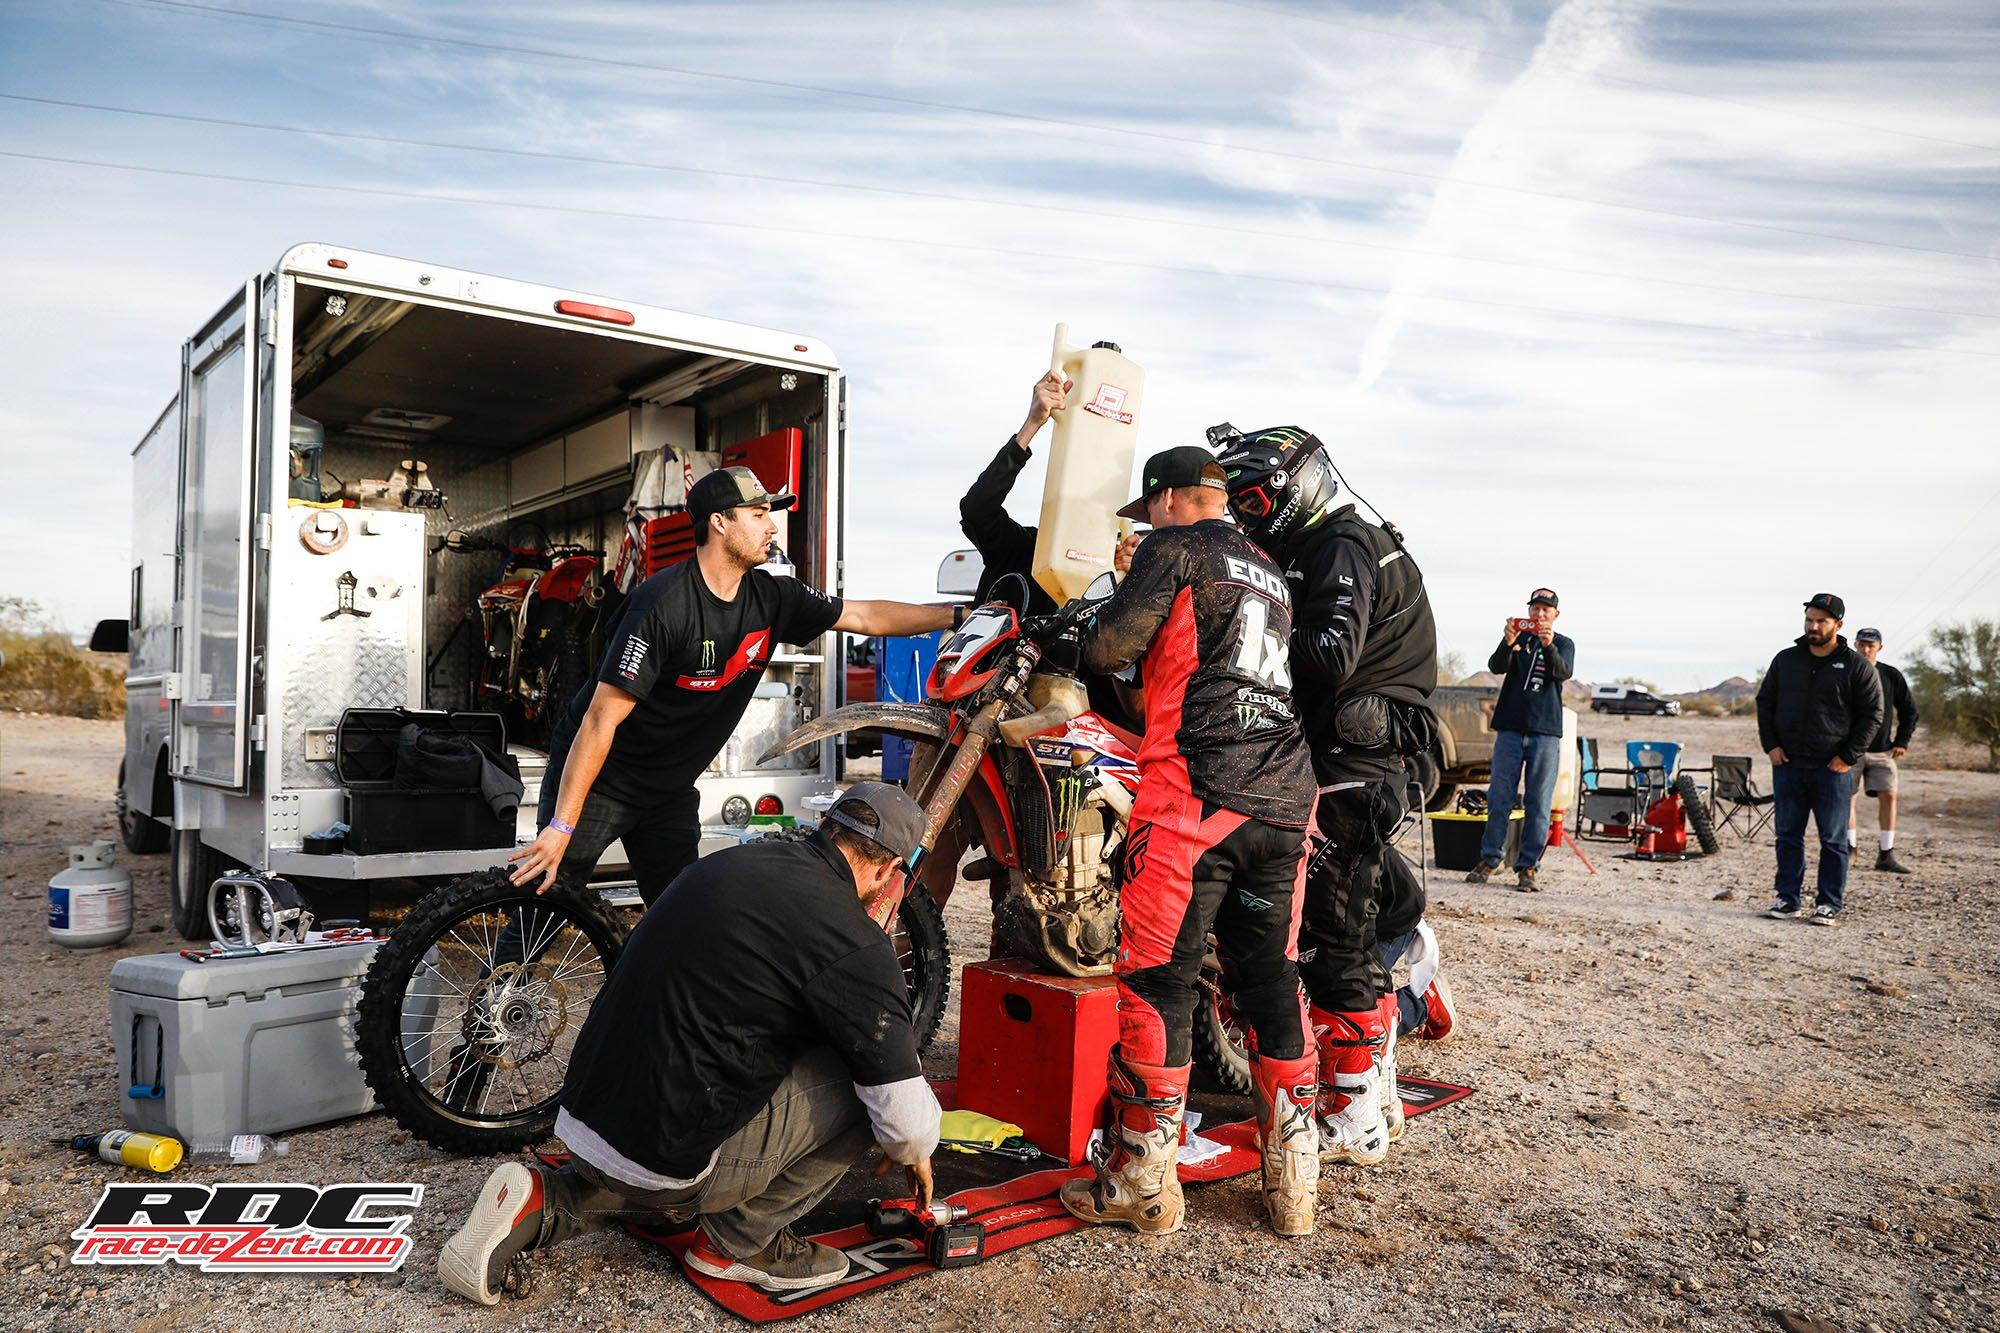 2019-score-baja1000-1x-westx1000-race-dezert-005.jpg